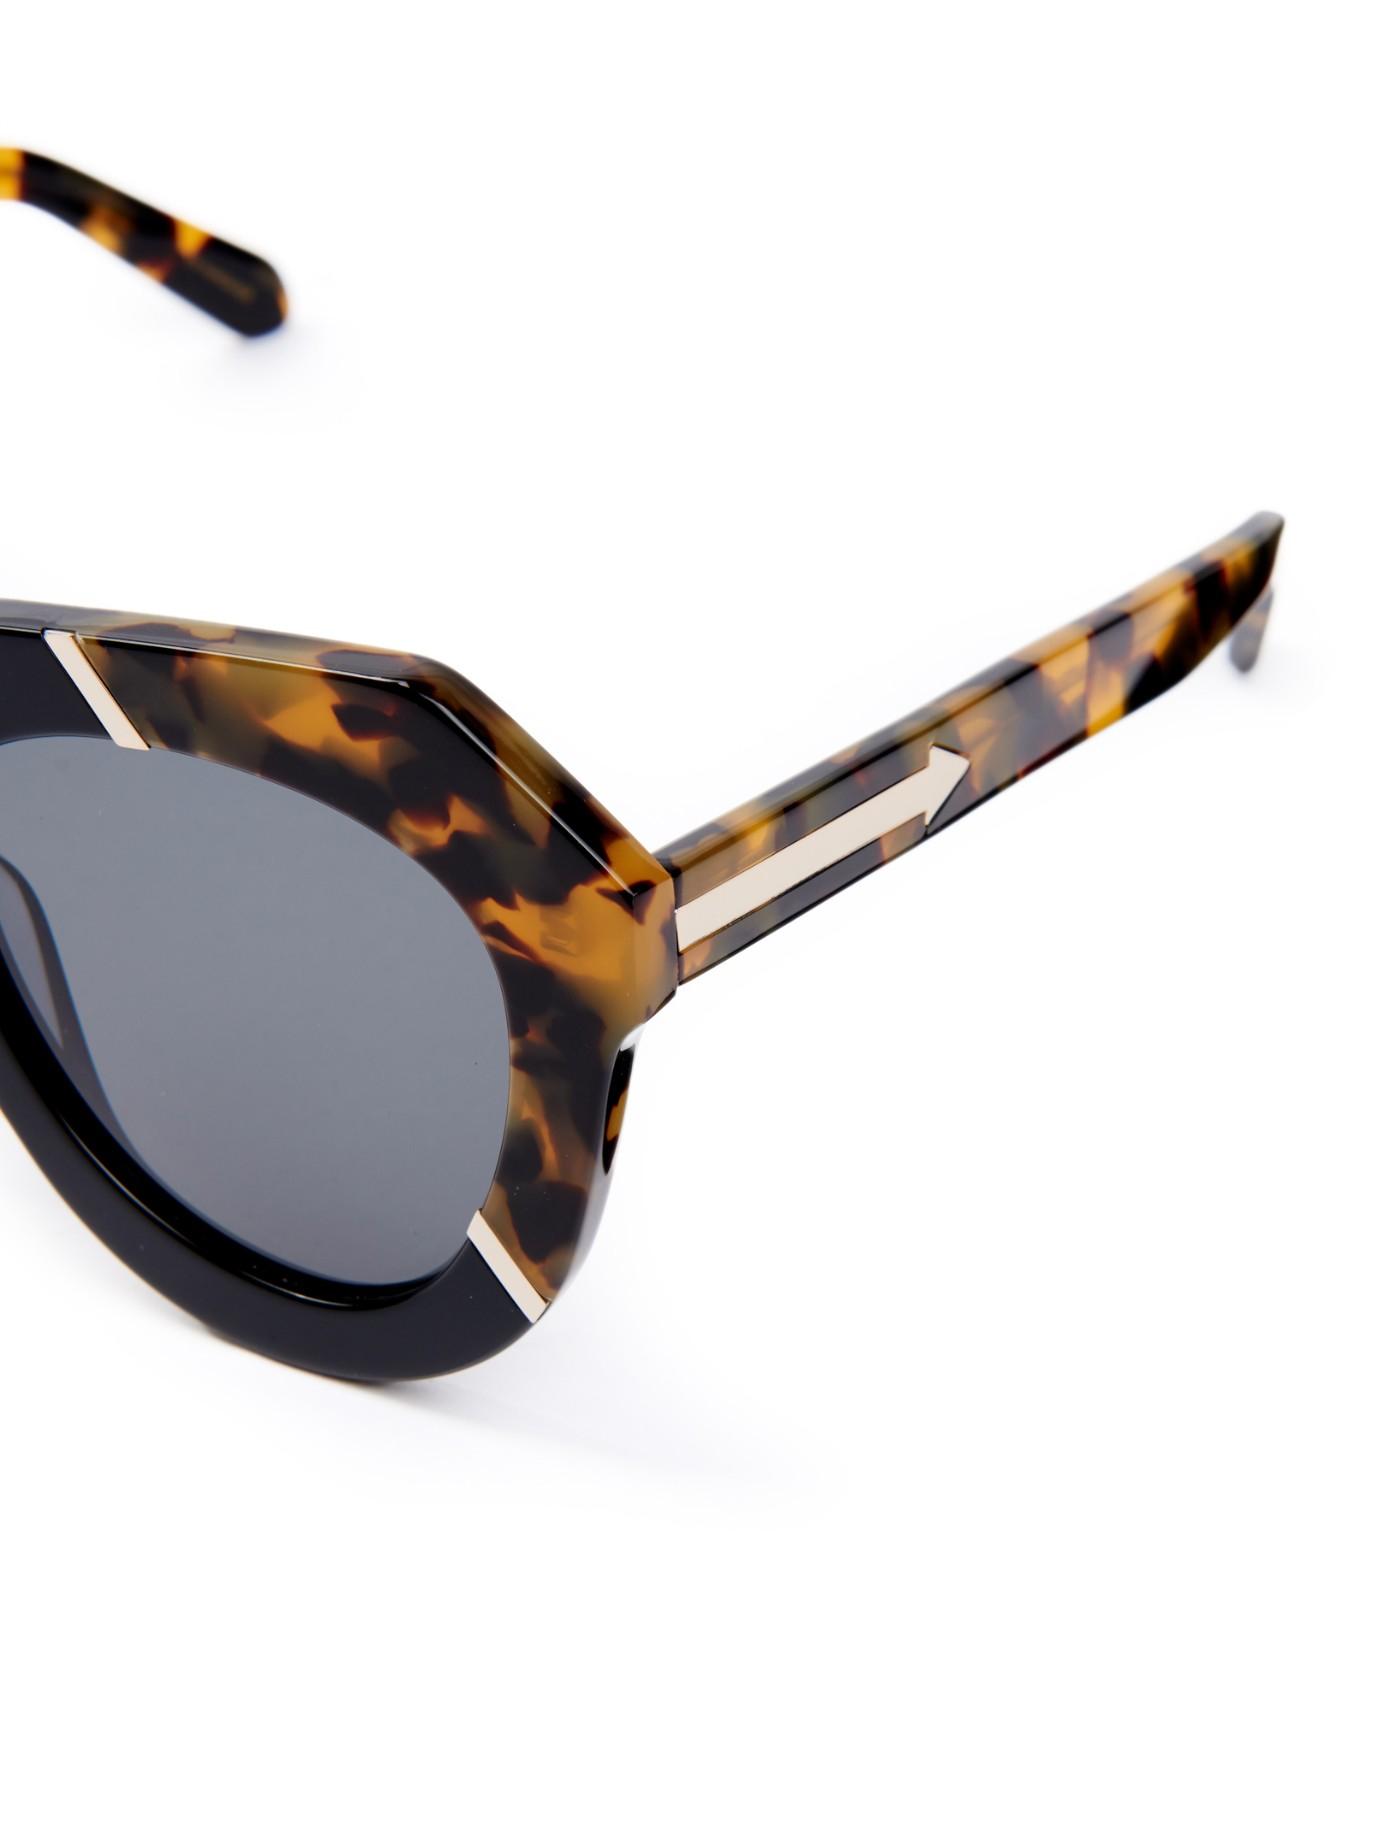 27f8c22741b Karen Walker One Splash Sunglasses in Brown - Lyst